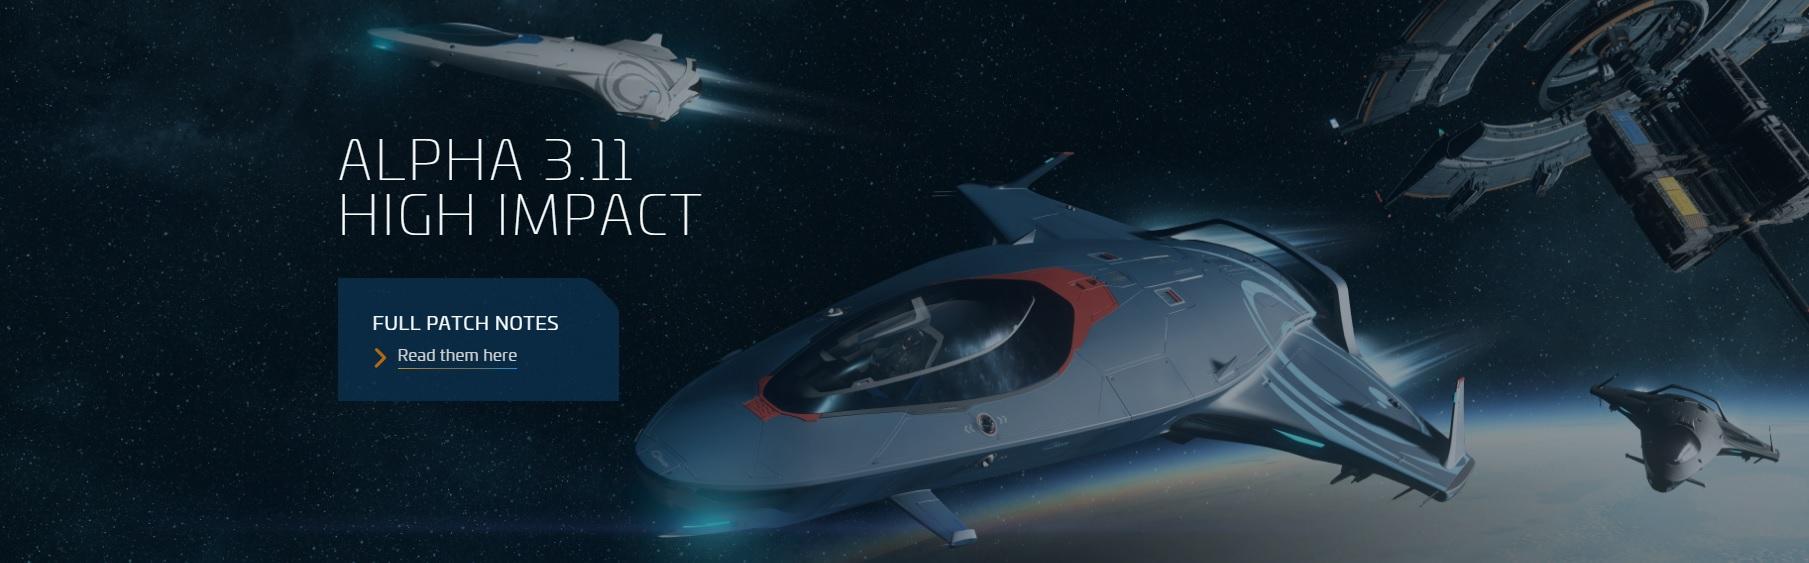 [3.11 Alpha — High Impact] Вышла новая версия Star Citizen